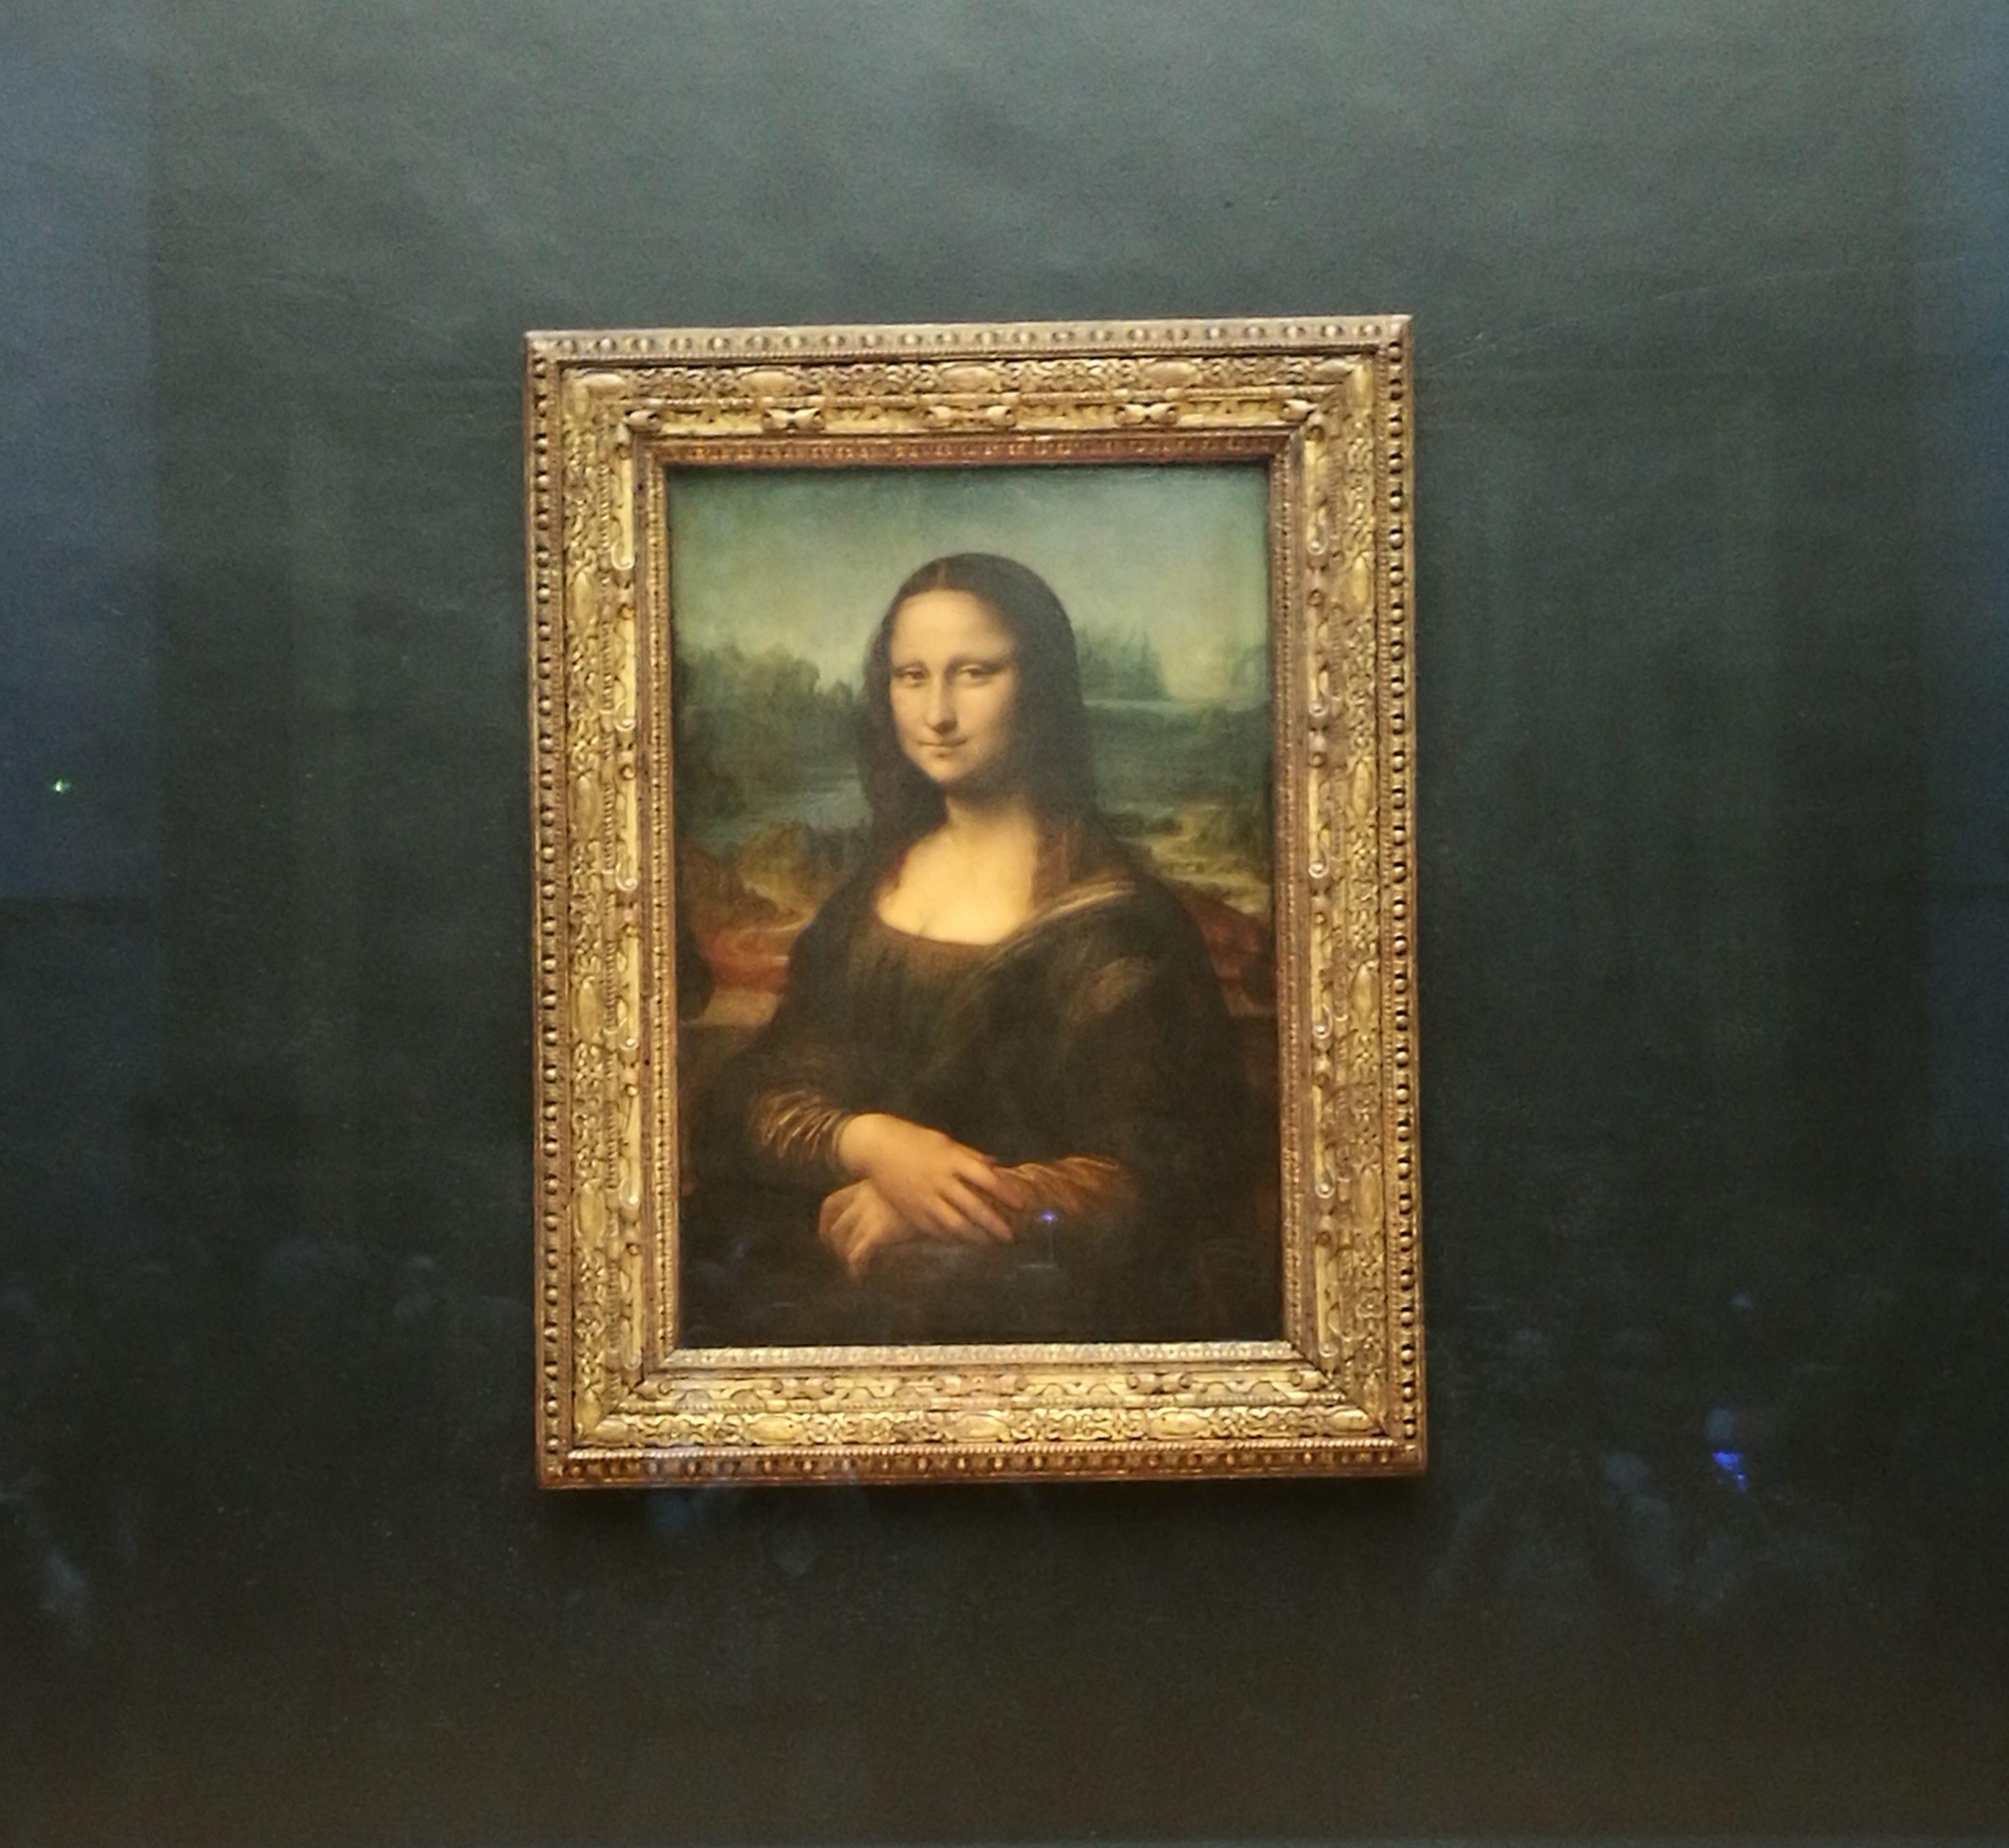 gioconda-monalisa-louvre